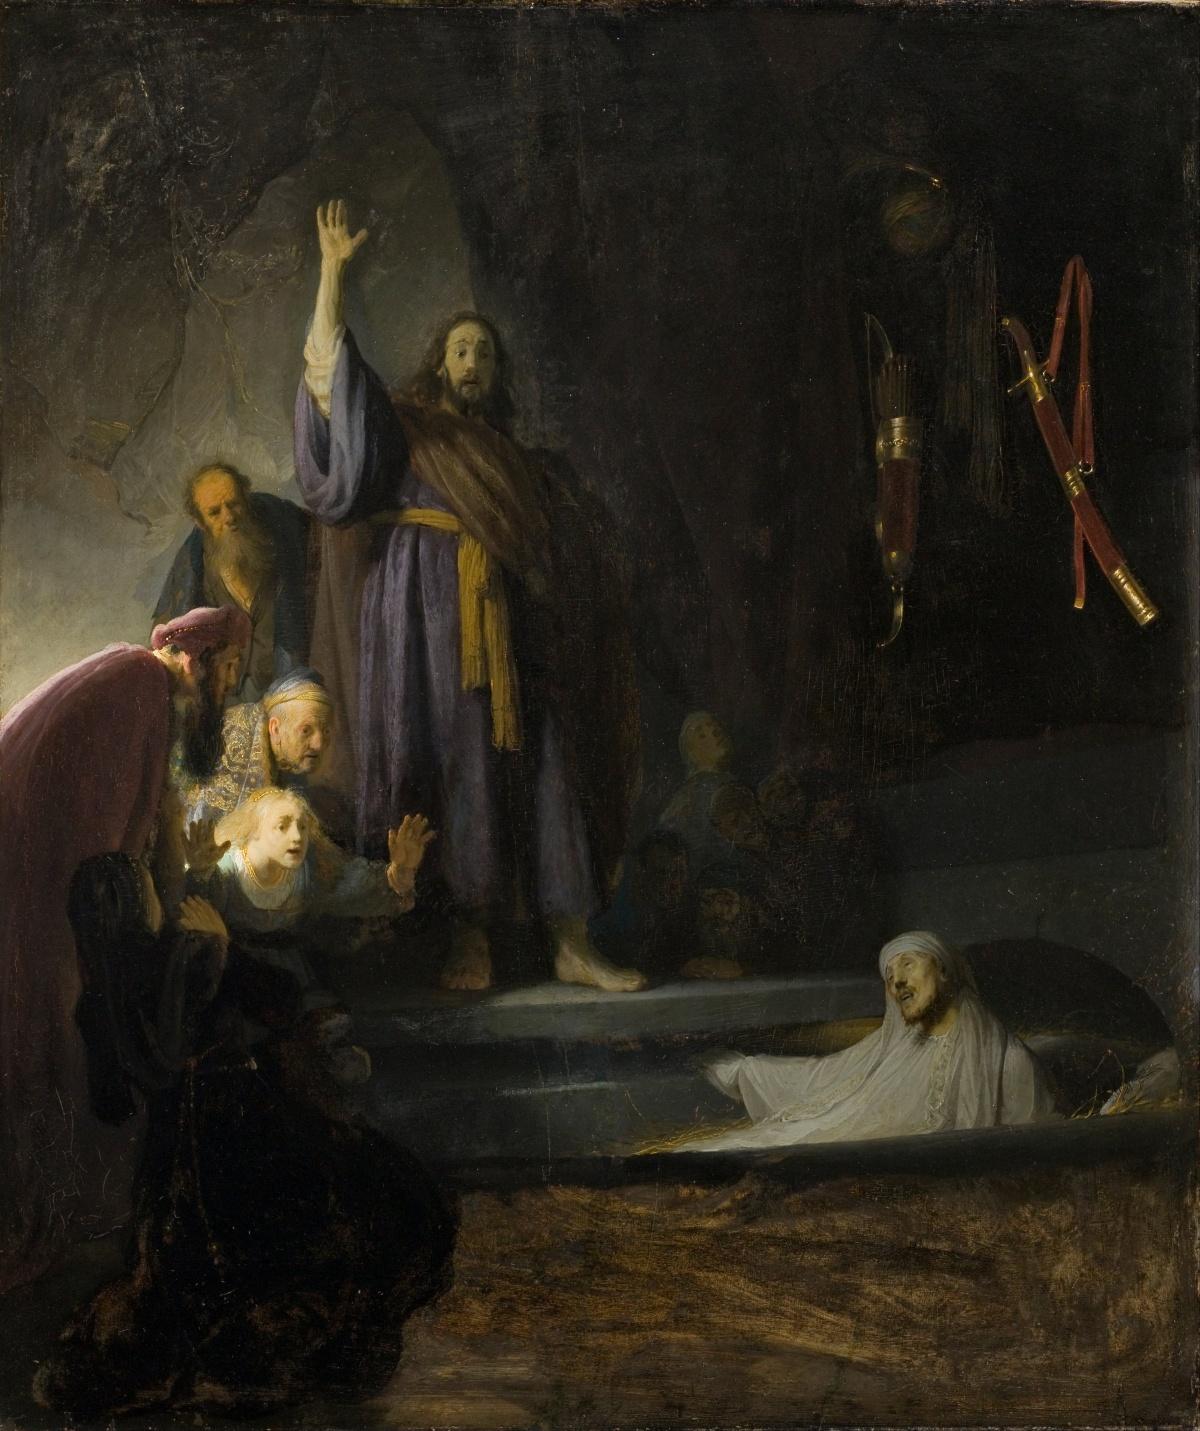 Jan 24th - John 11_1-16 - The_Raising_of_Lazarus by Rembrandt Harmensz. van Rijn